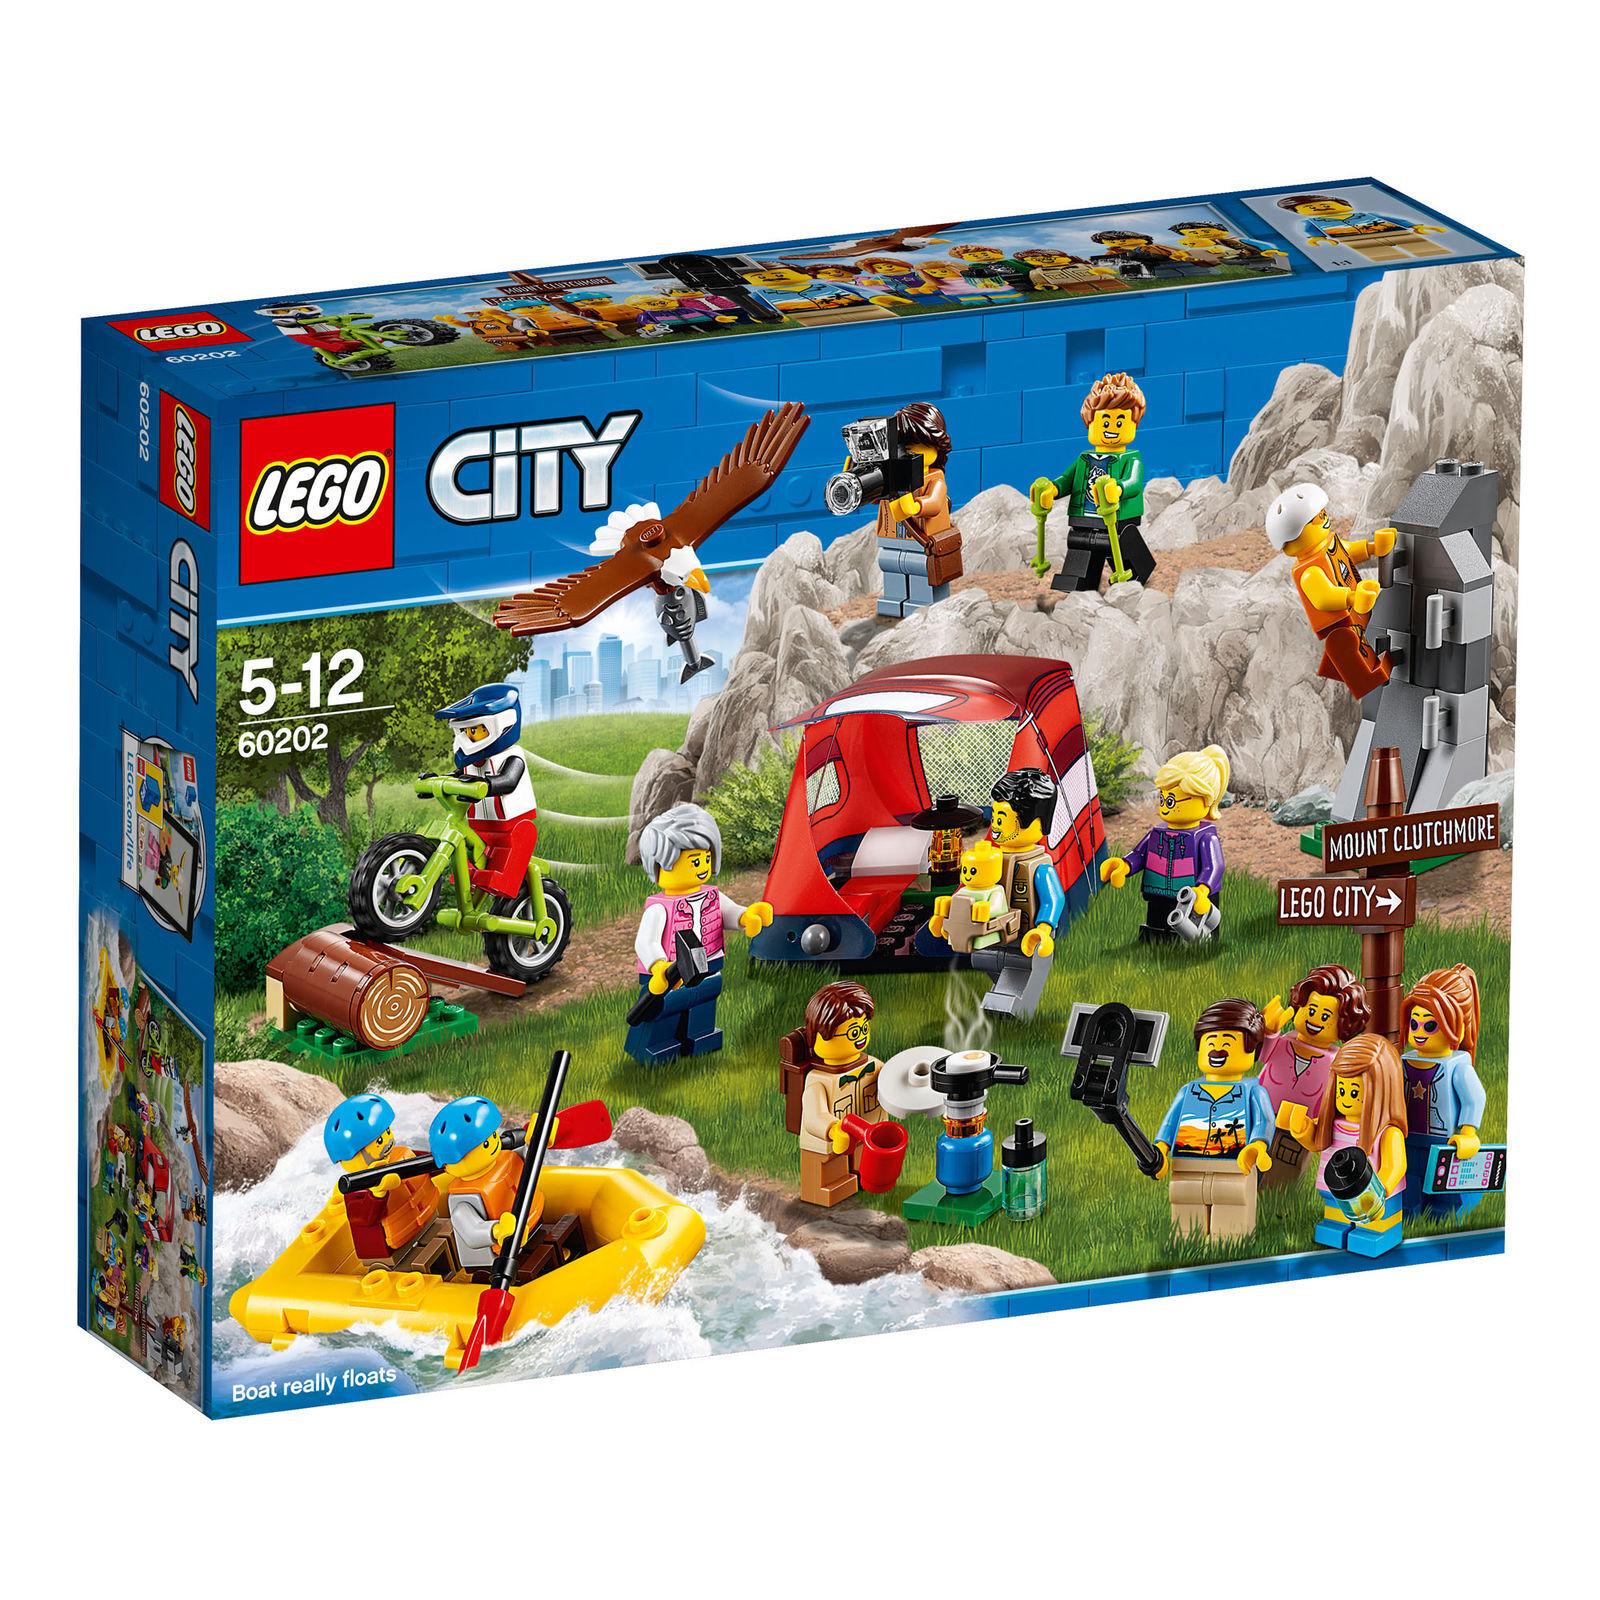 Lego City 60202 Stadtbewohner (Habitants de la Ville   Citadin) -